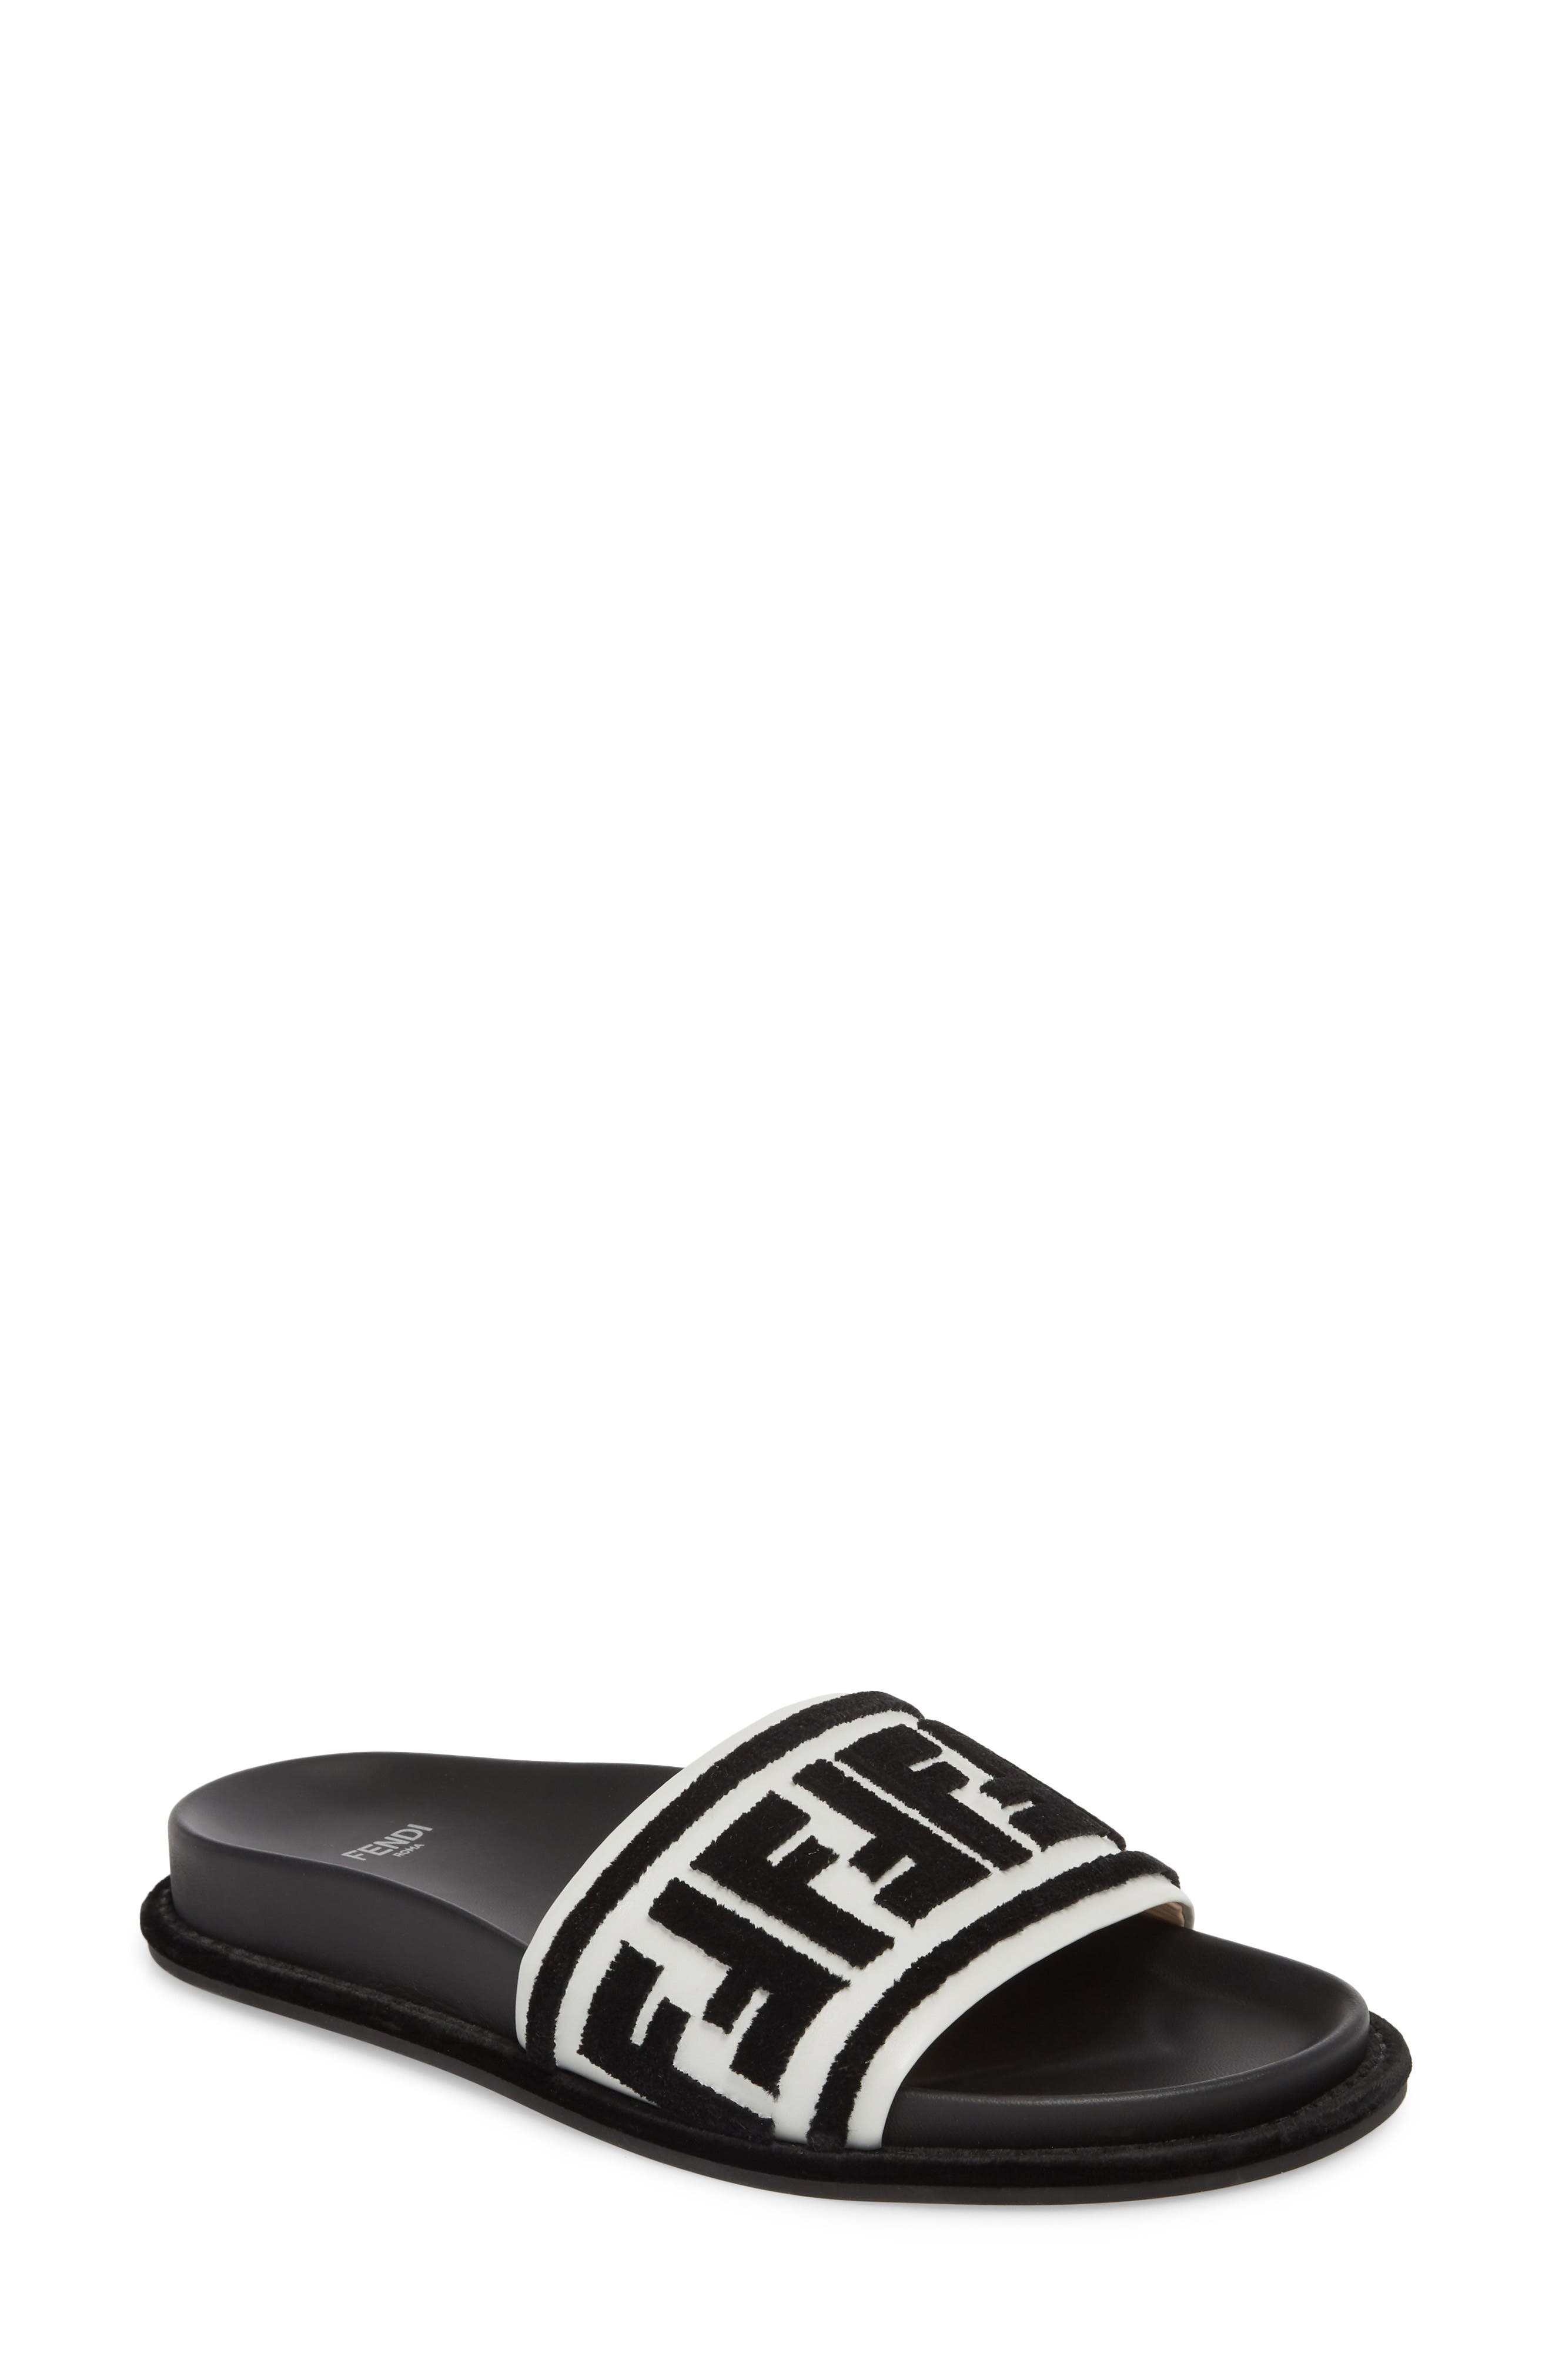 Fun Fendi Logo Slide Sandal,                         Main,                         color, BLACK/ WHITE